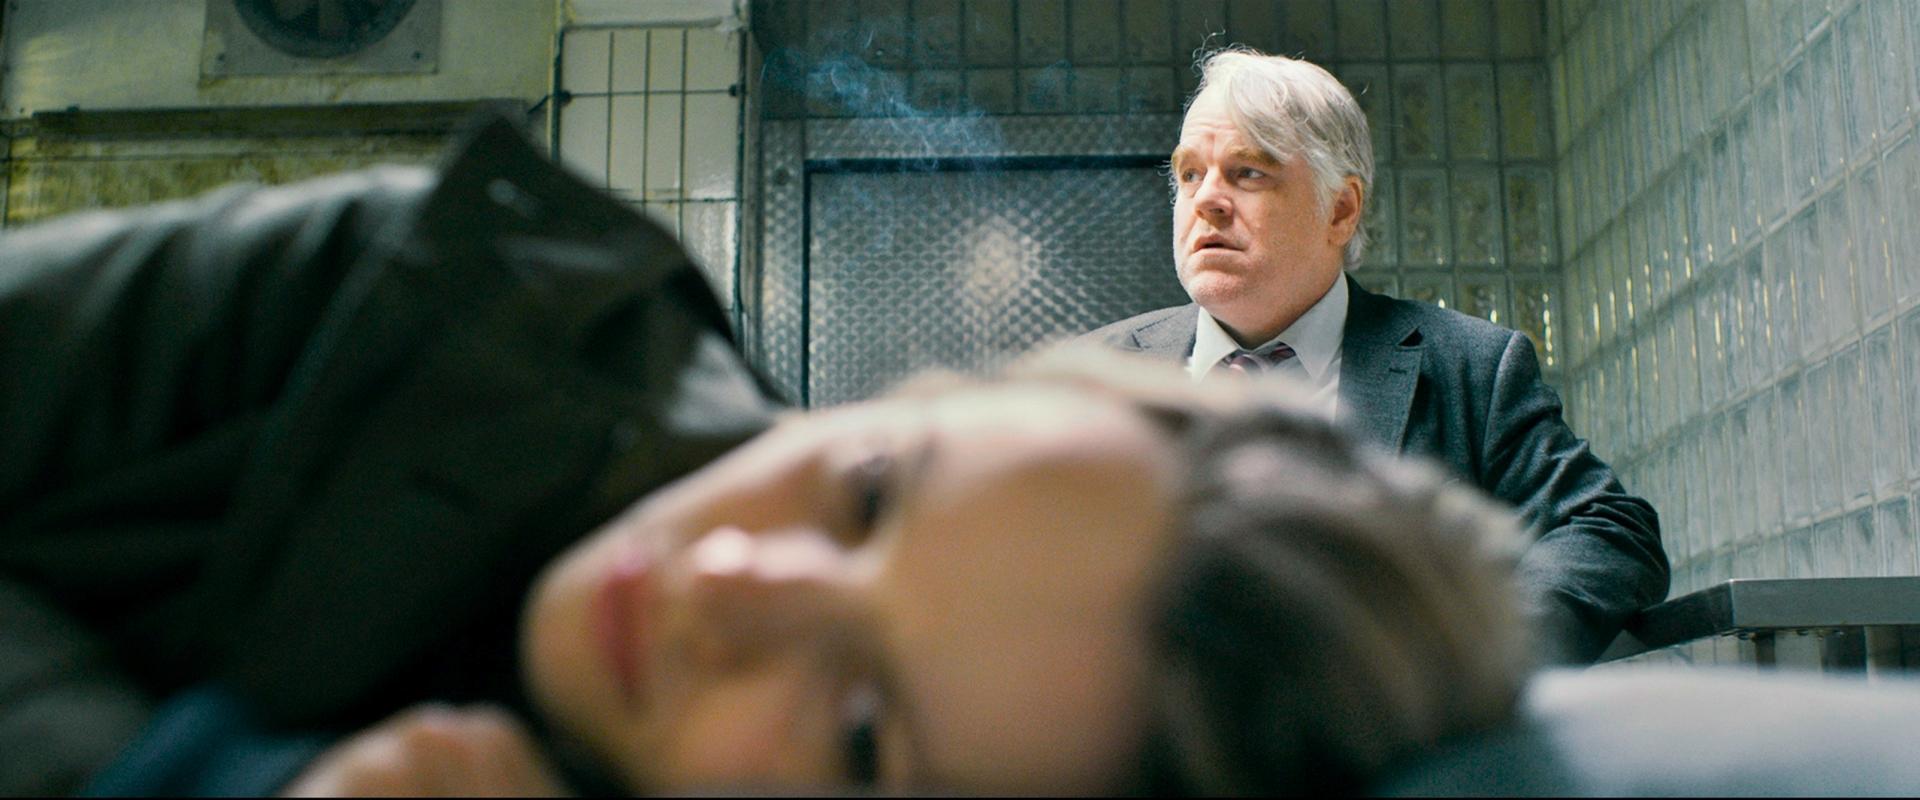 La Spia - A Most Wanted Man - CineFatti